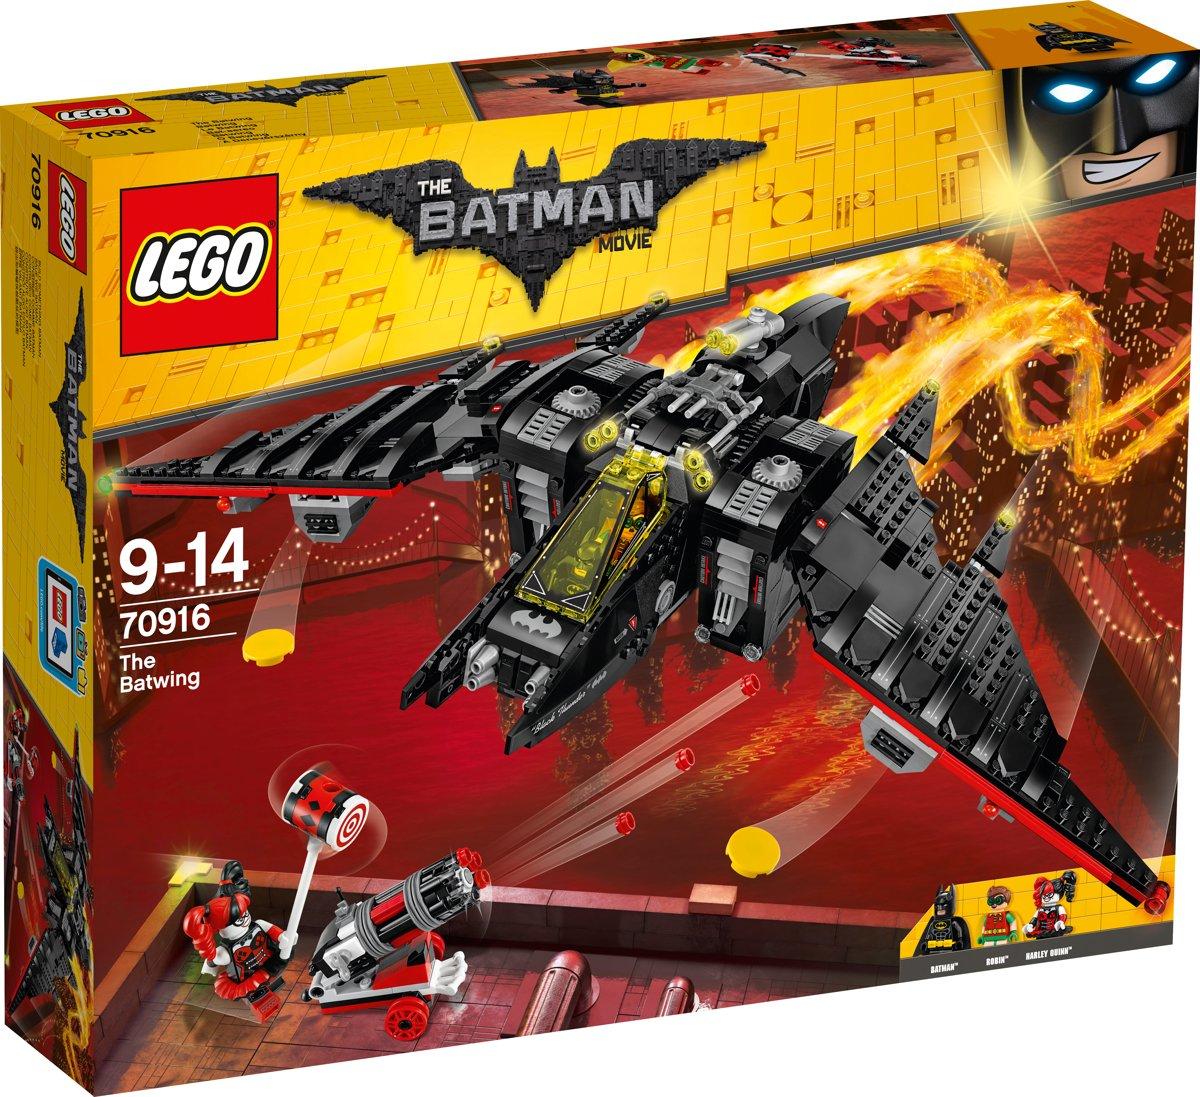 LEGO Batman Movie De Batwing (70916) voor €49,99 @ Bol.com